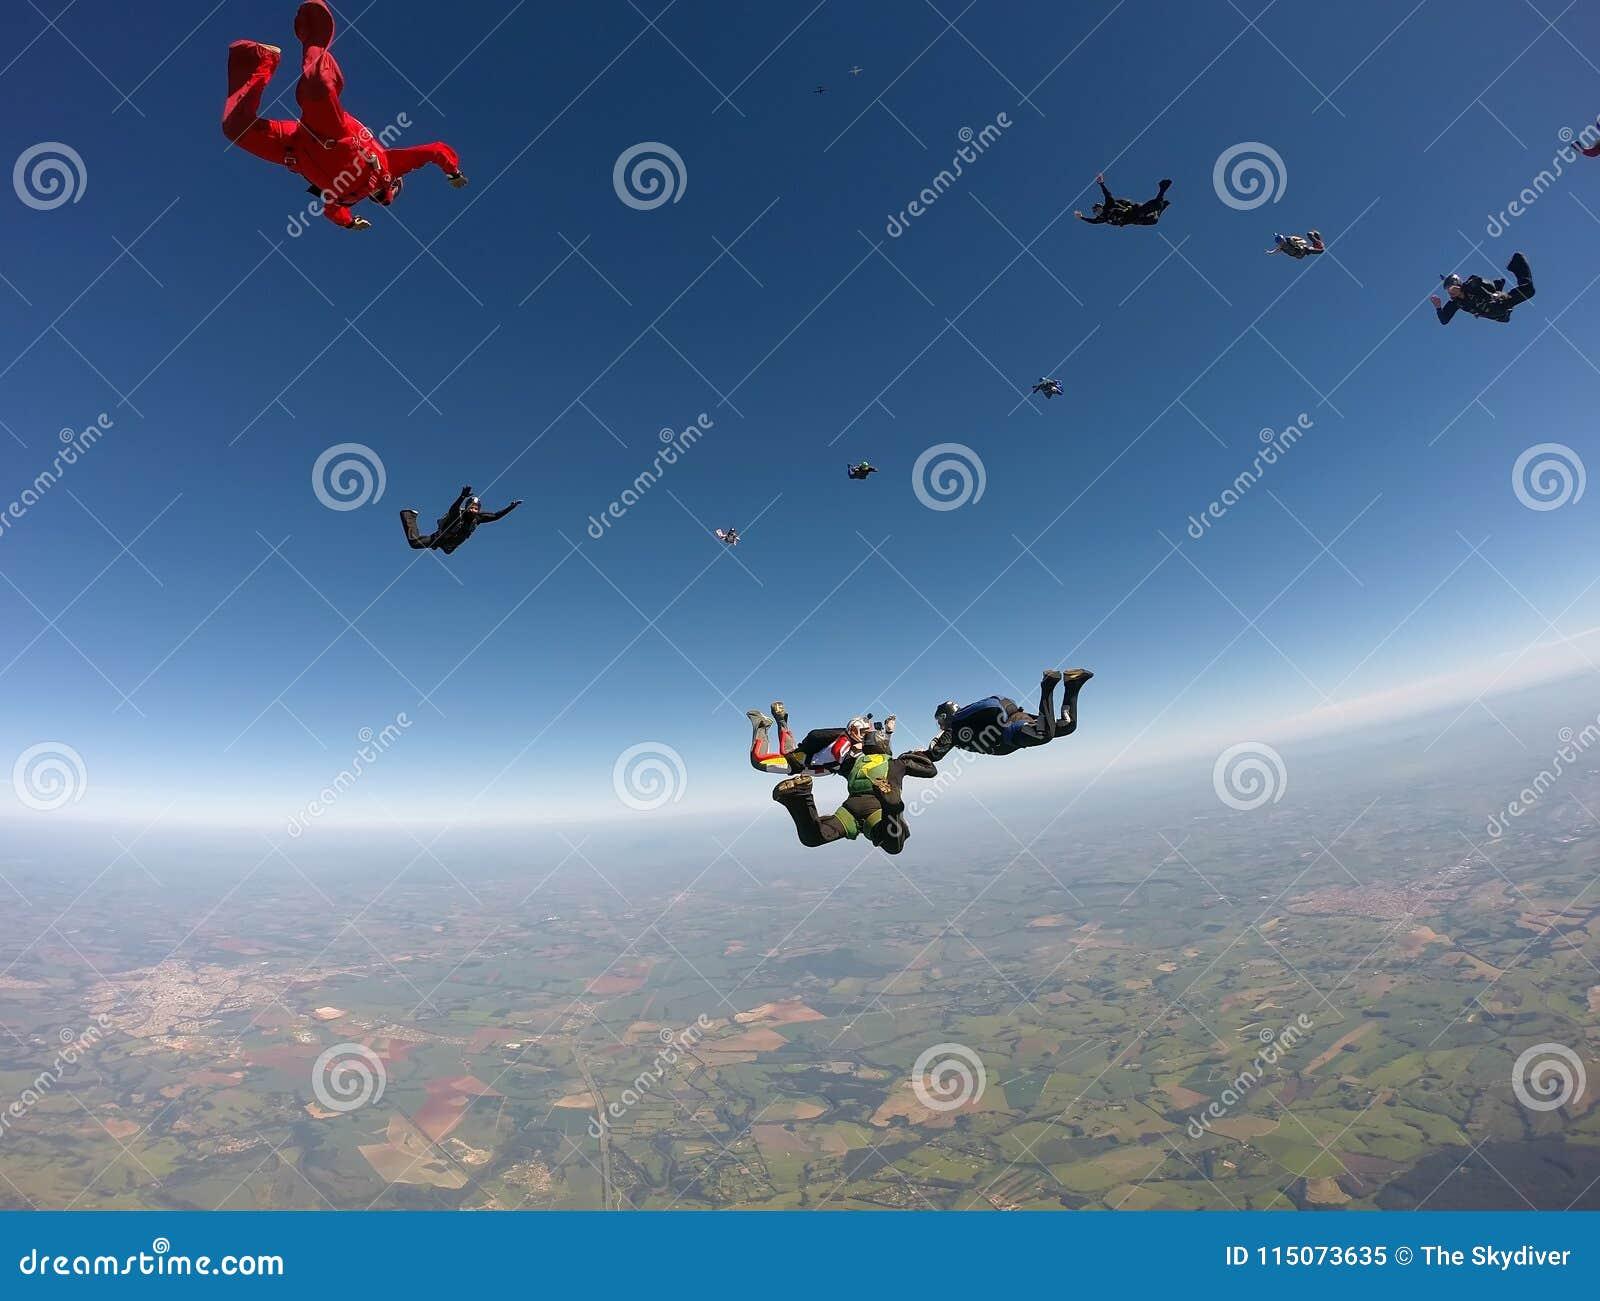 De vorming van de Skydivingsgroep